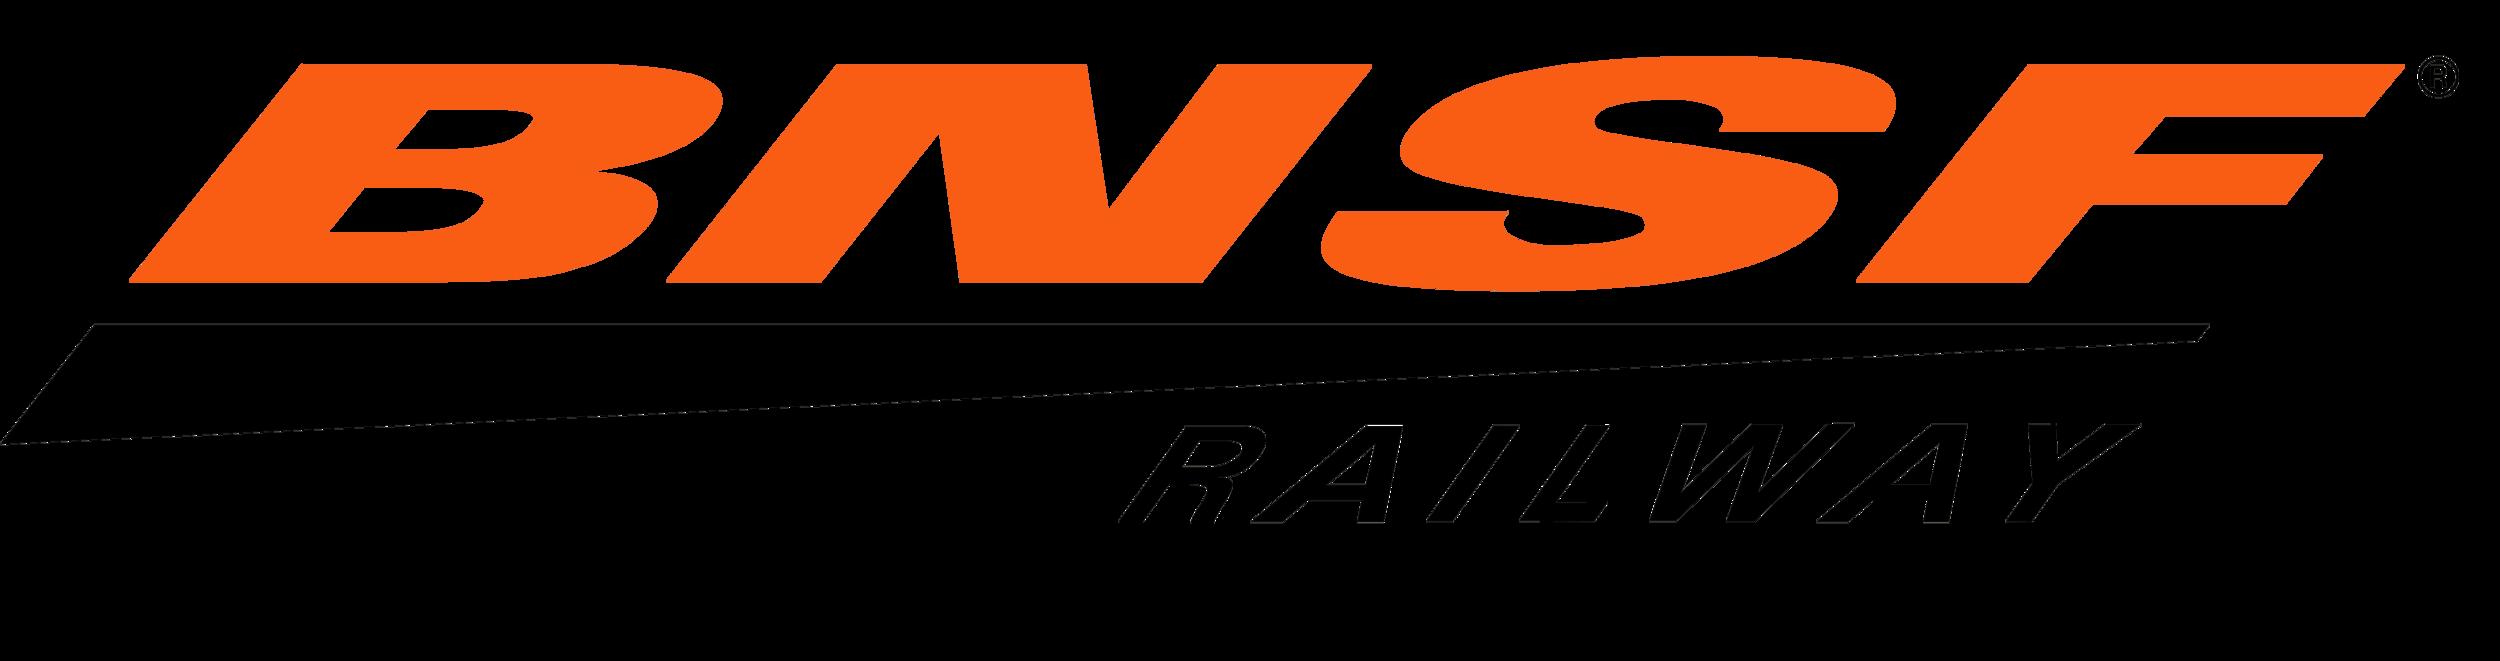 BNSF_logo.png